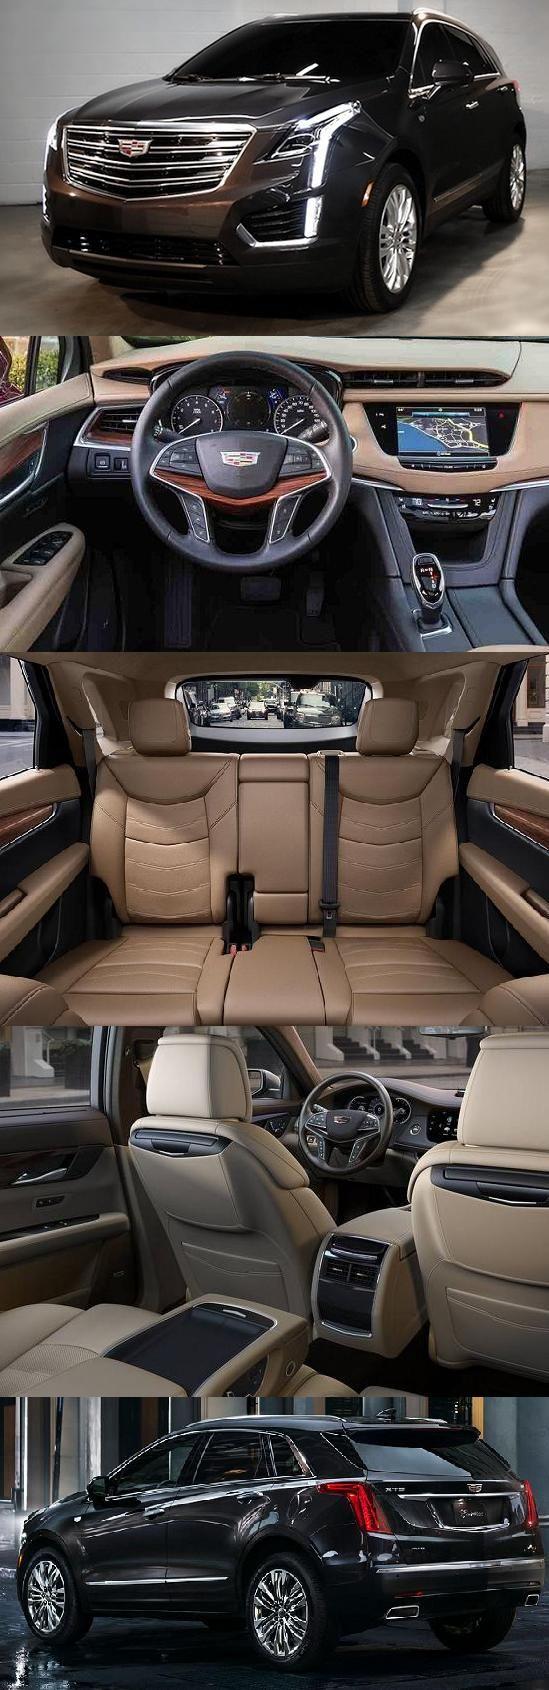 2018 Cadillac XT5.  Cadillac XT5 2018 luxury crossover